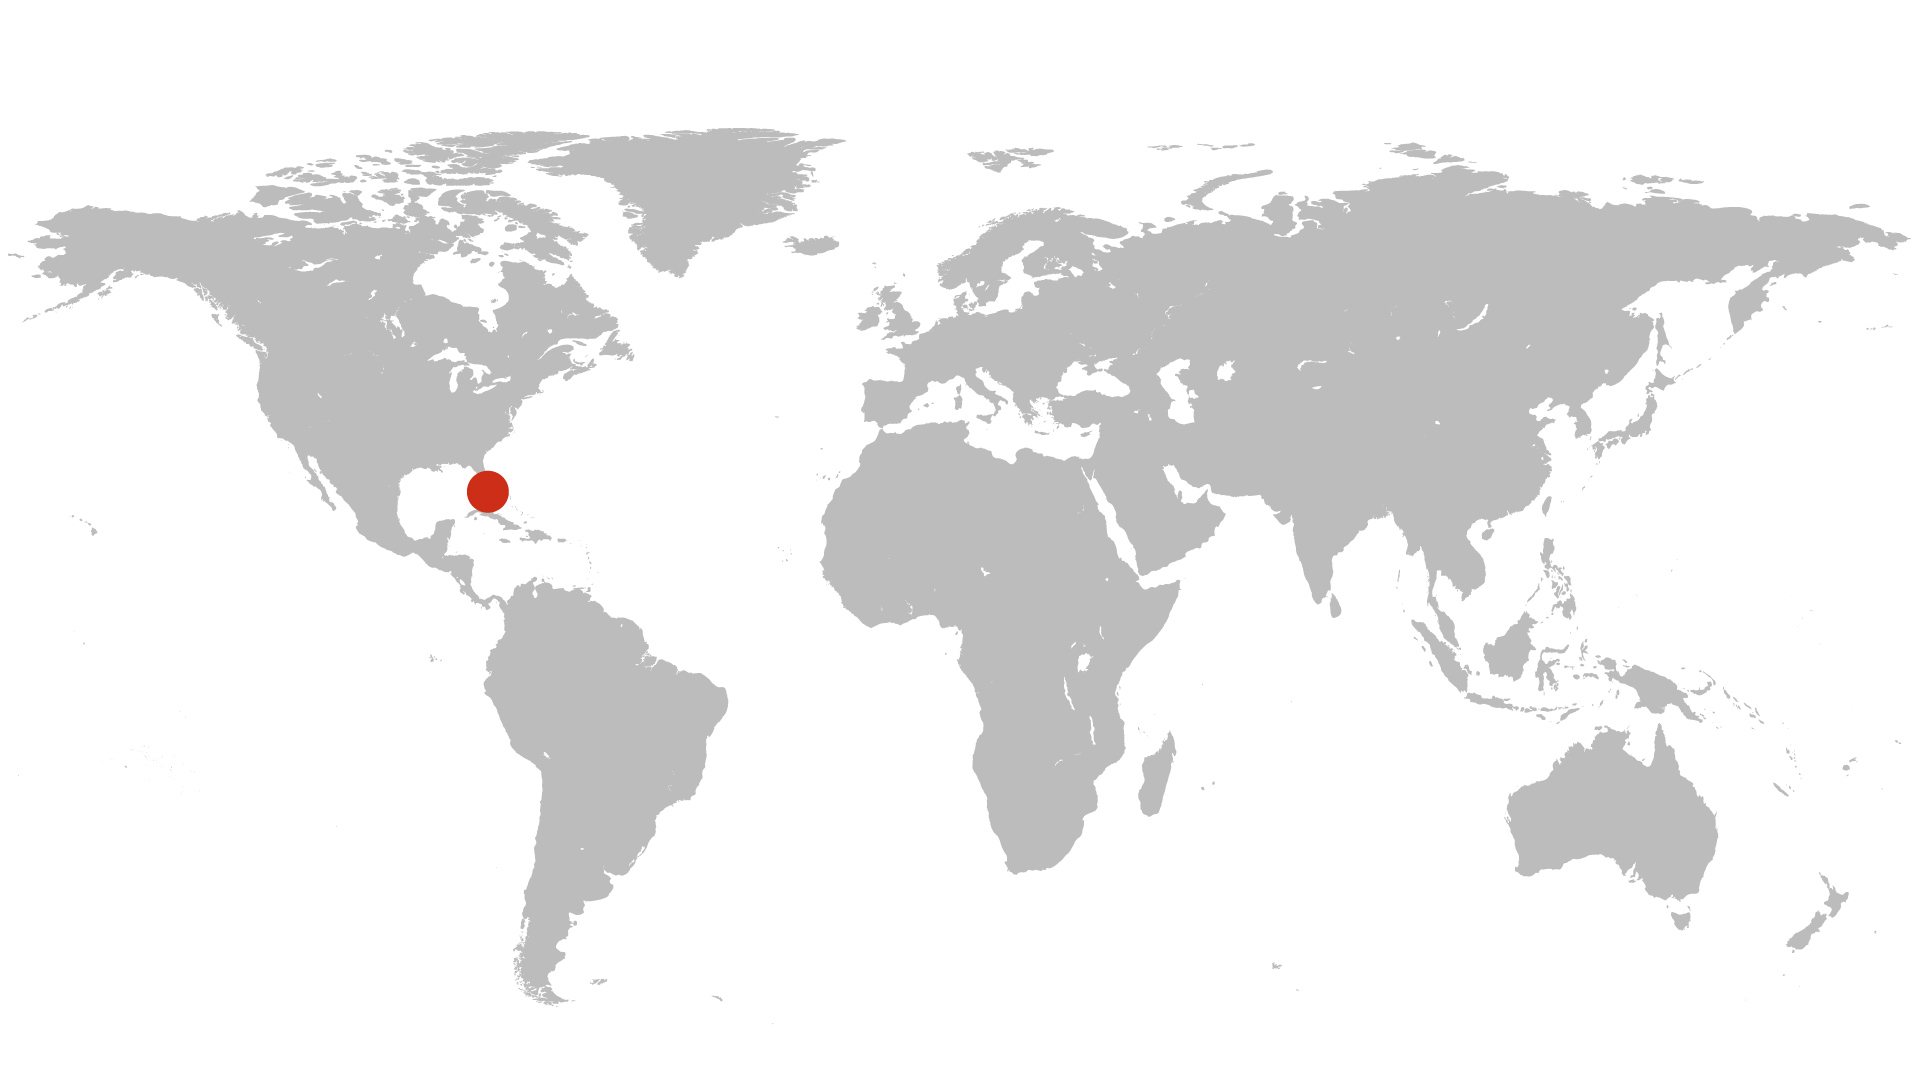 JB_WEB_World_Map_D02_Ford_City_One.jpg